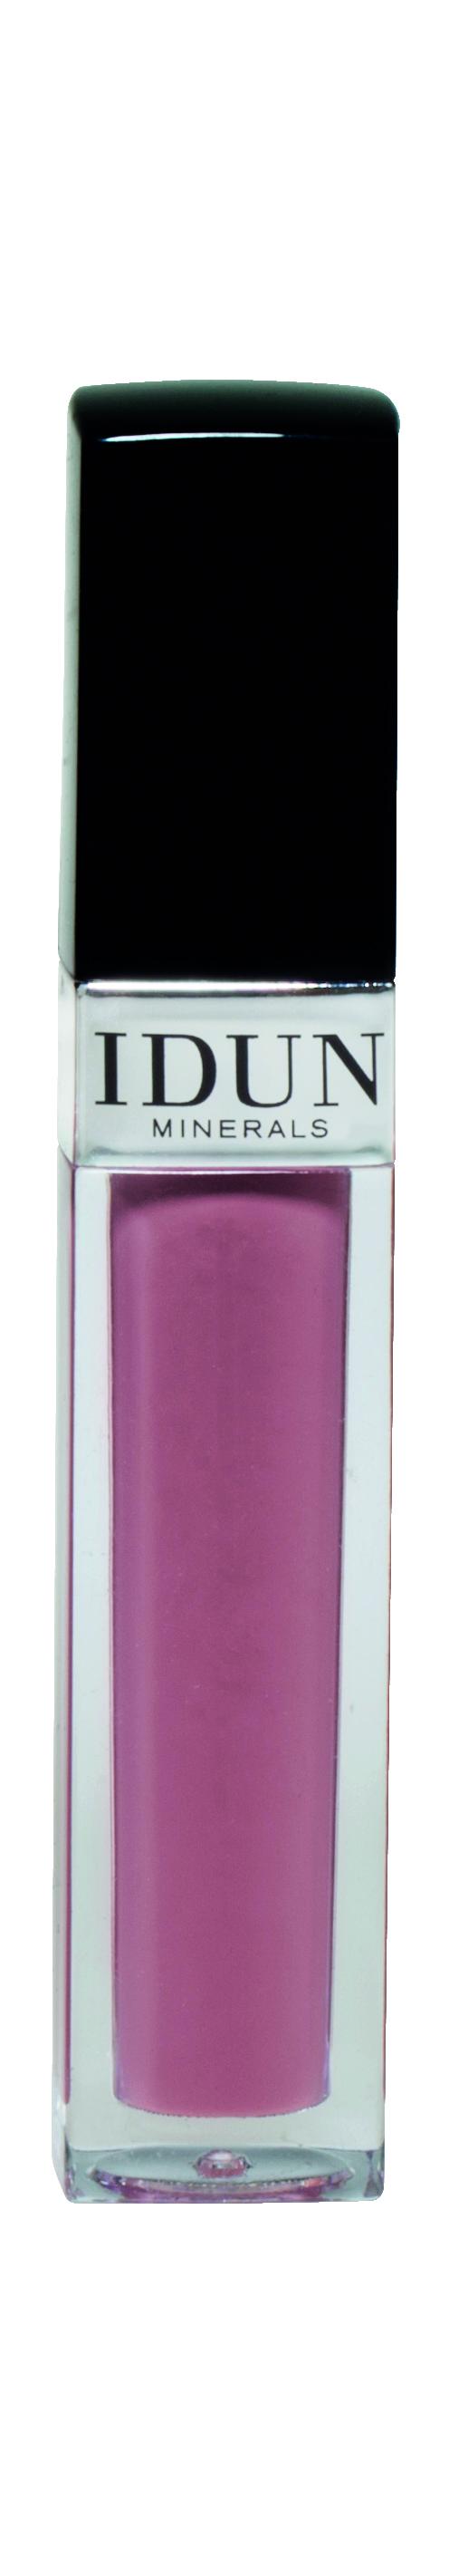 IDUN Minerals Lipgloss, josephine